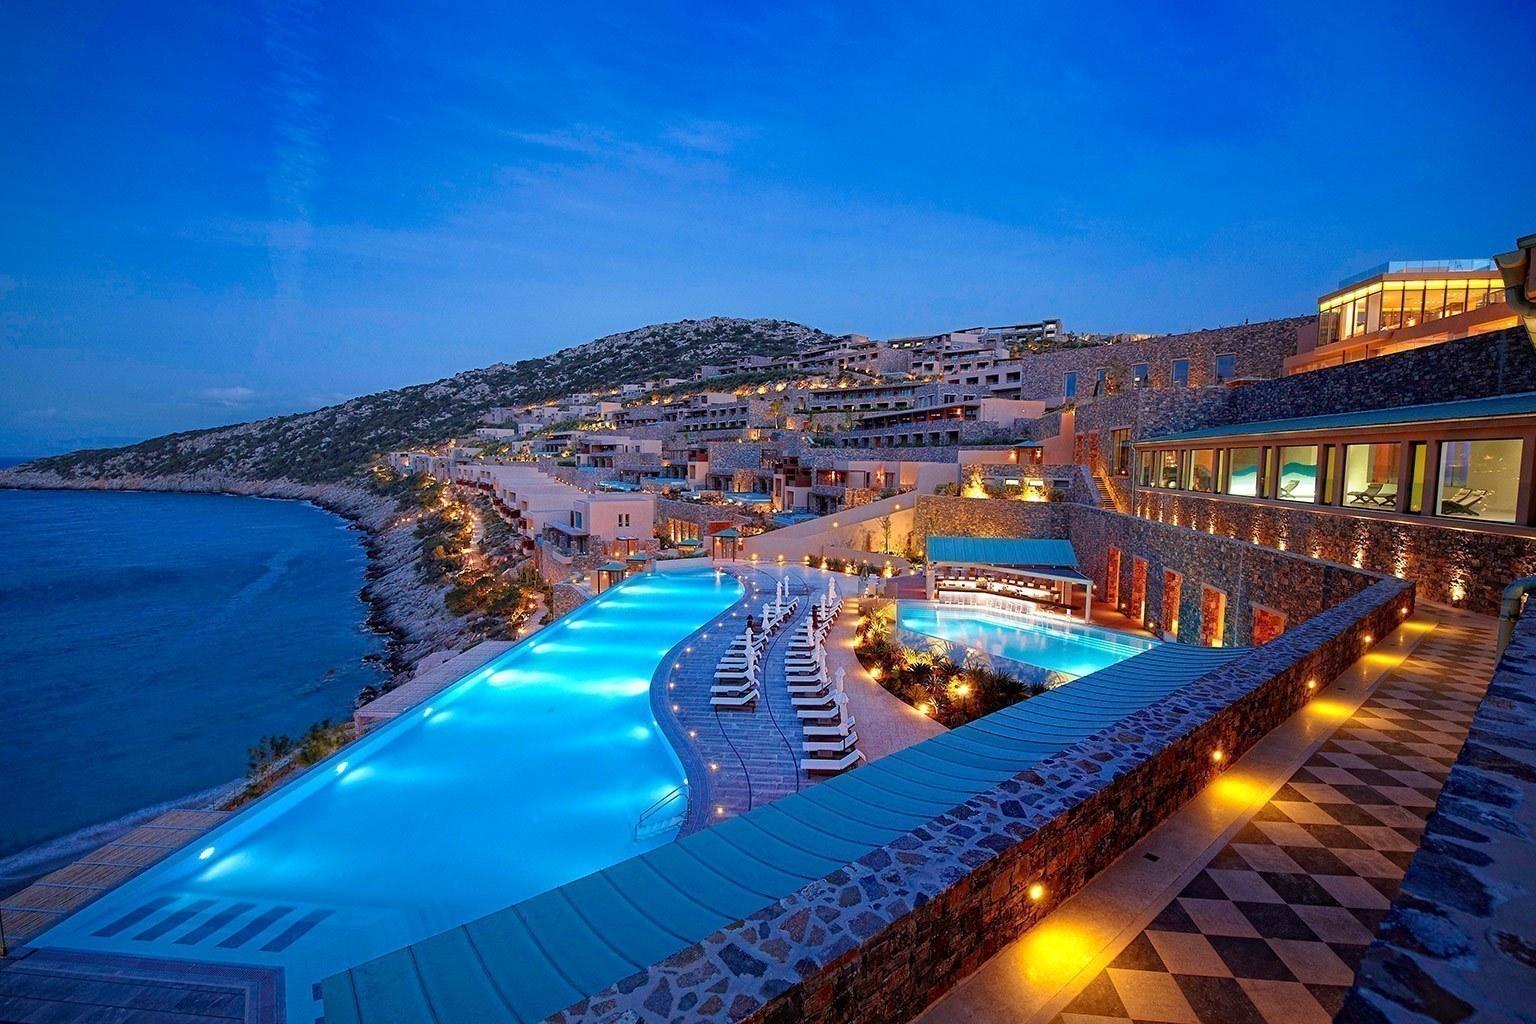 Hotel Spa Resort Montenegro